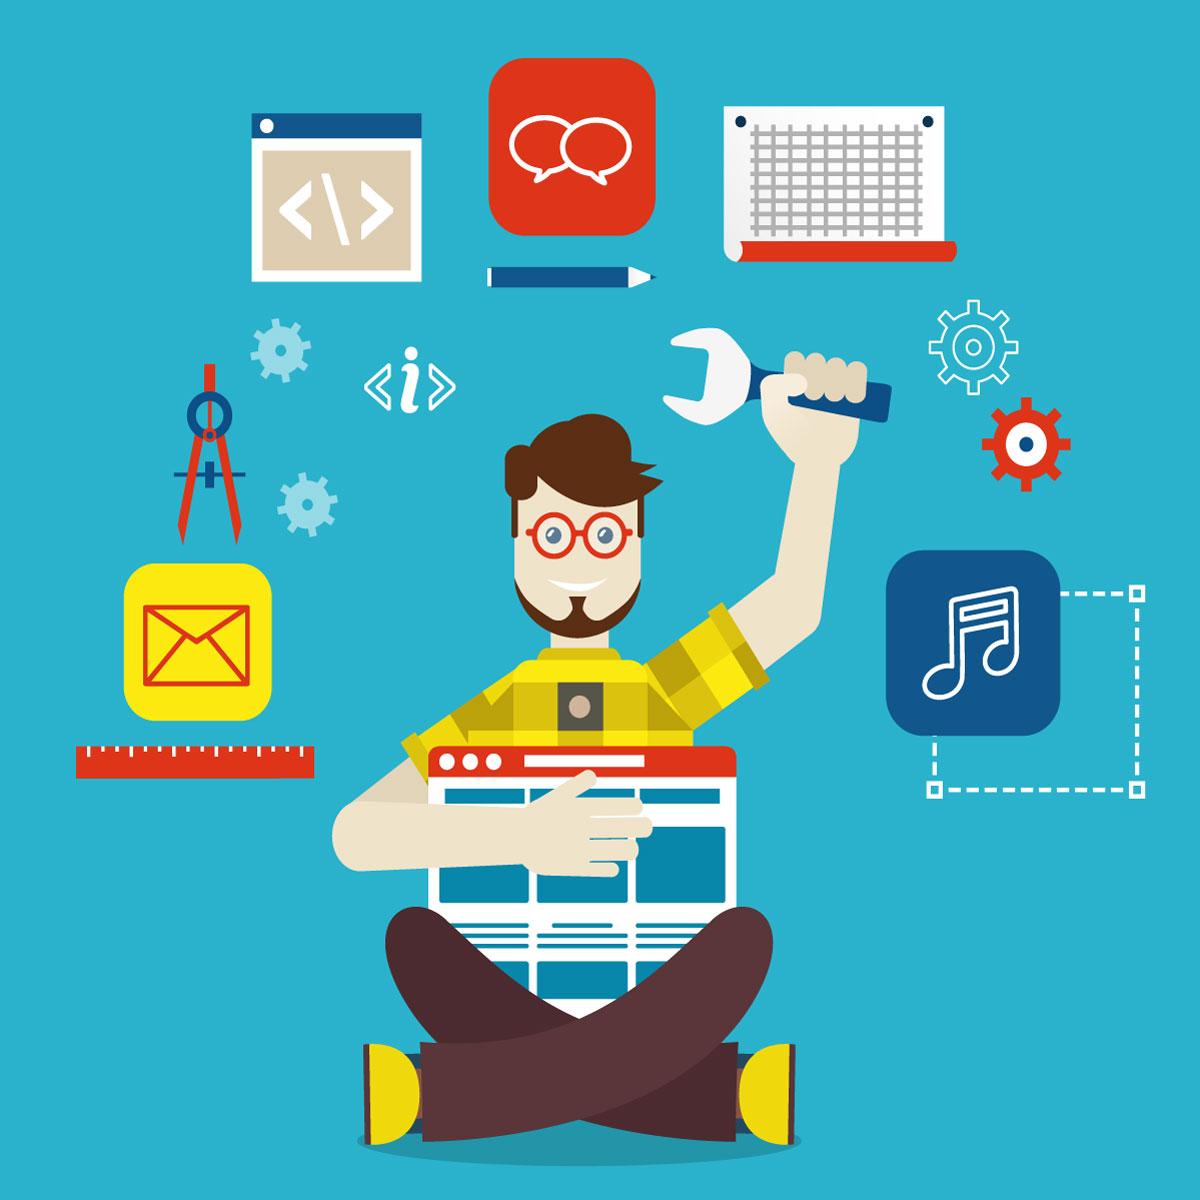 izrada sajtova razvoj poslovanja